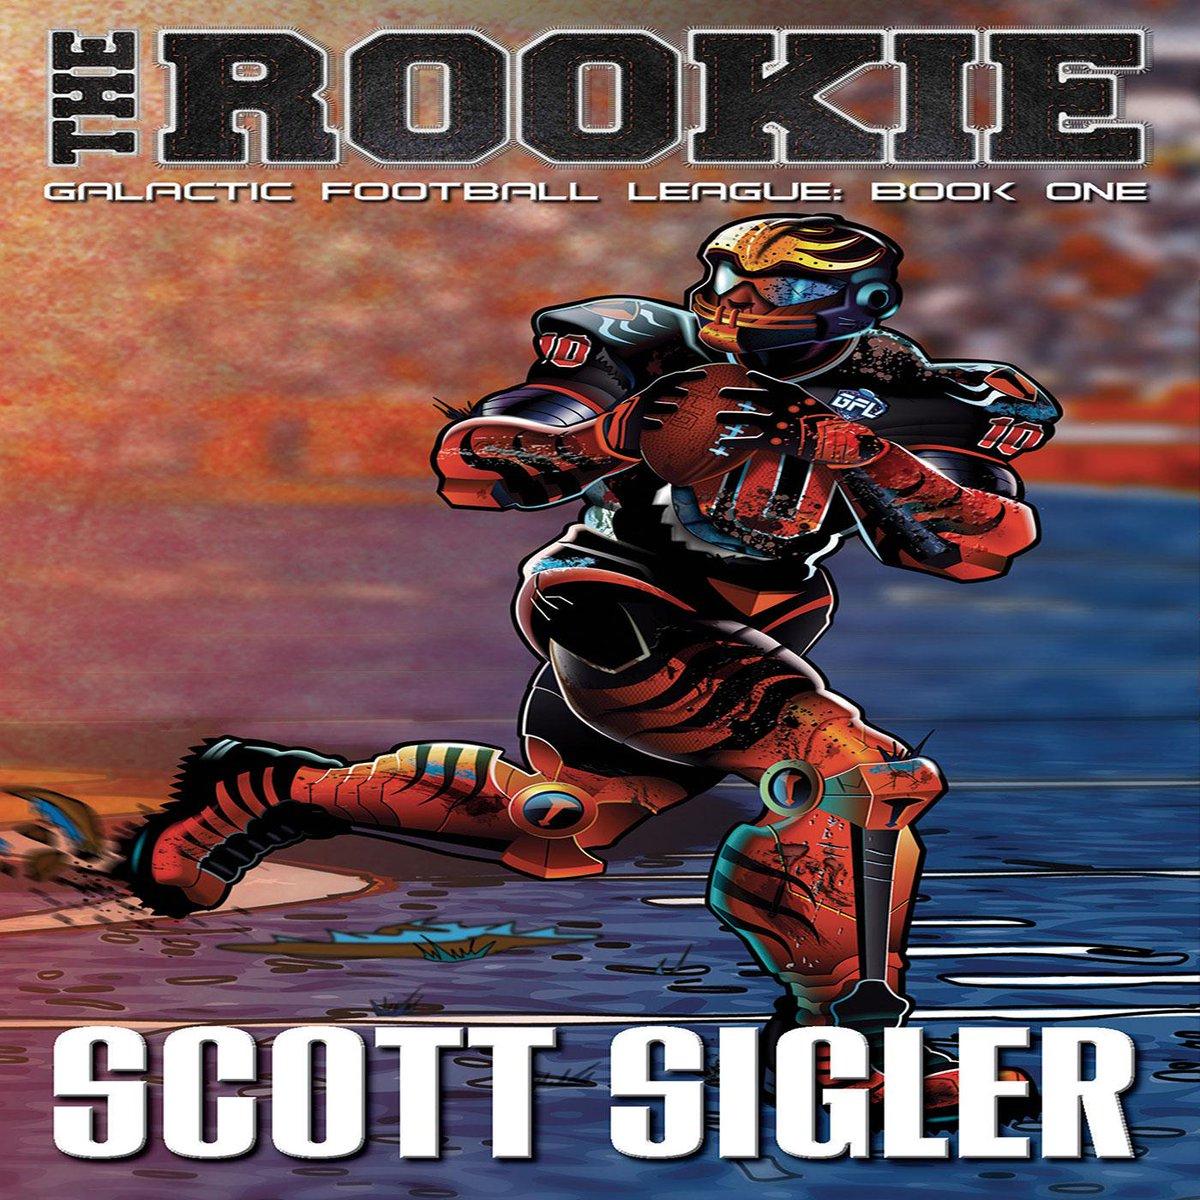 Set your timers!   1/1/15, @scottsigler's The Rookie will be back on http://t.co/RwPYMgCLhe!  GO KRAKENS! http://t.co/0gIsHbD2HU